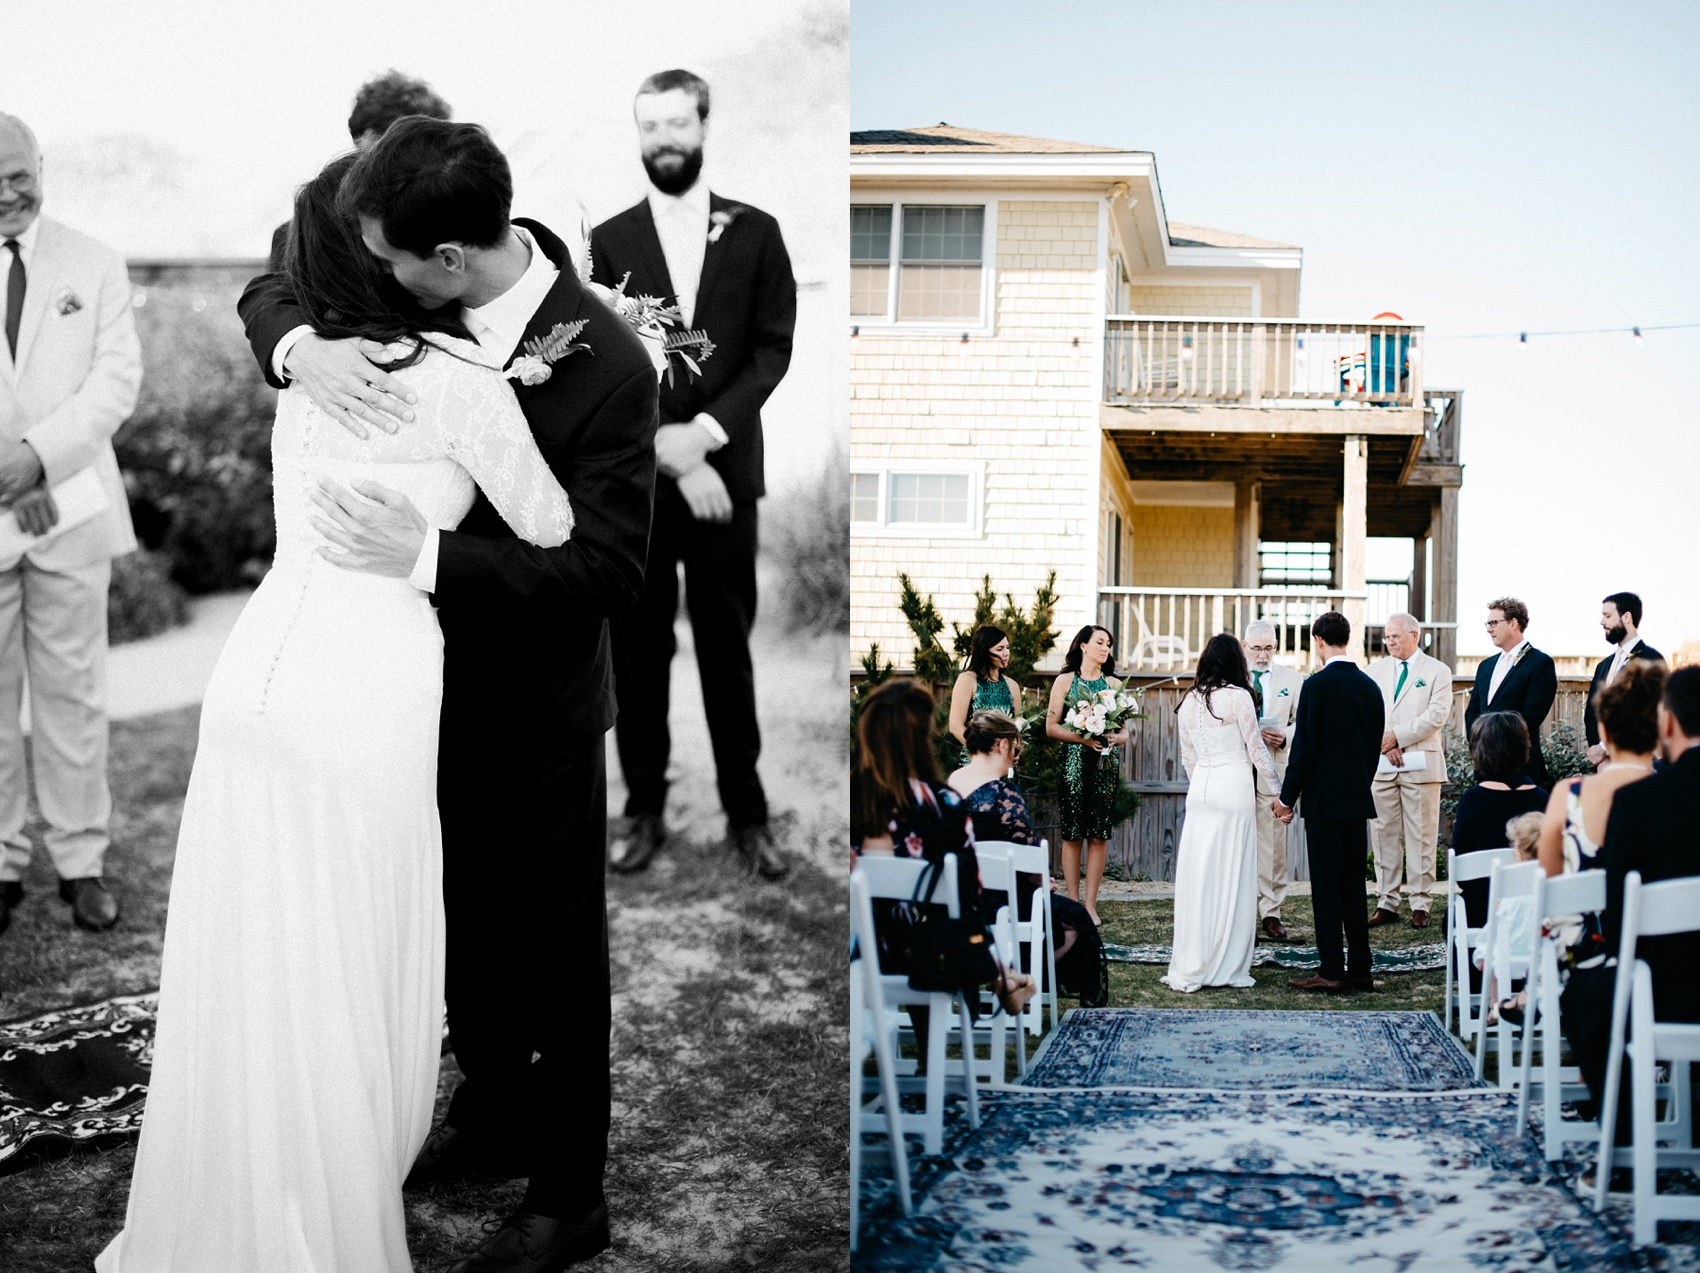 outerbanks_wedding_photographer_1279.jpg